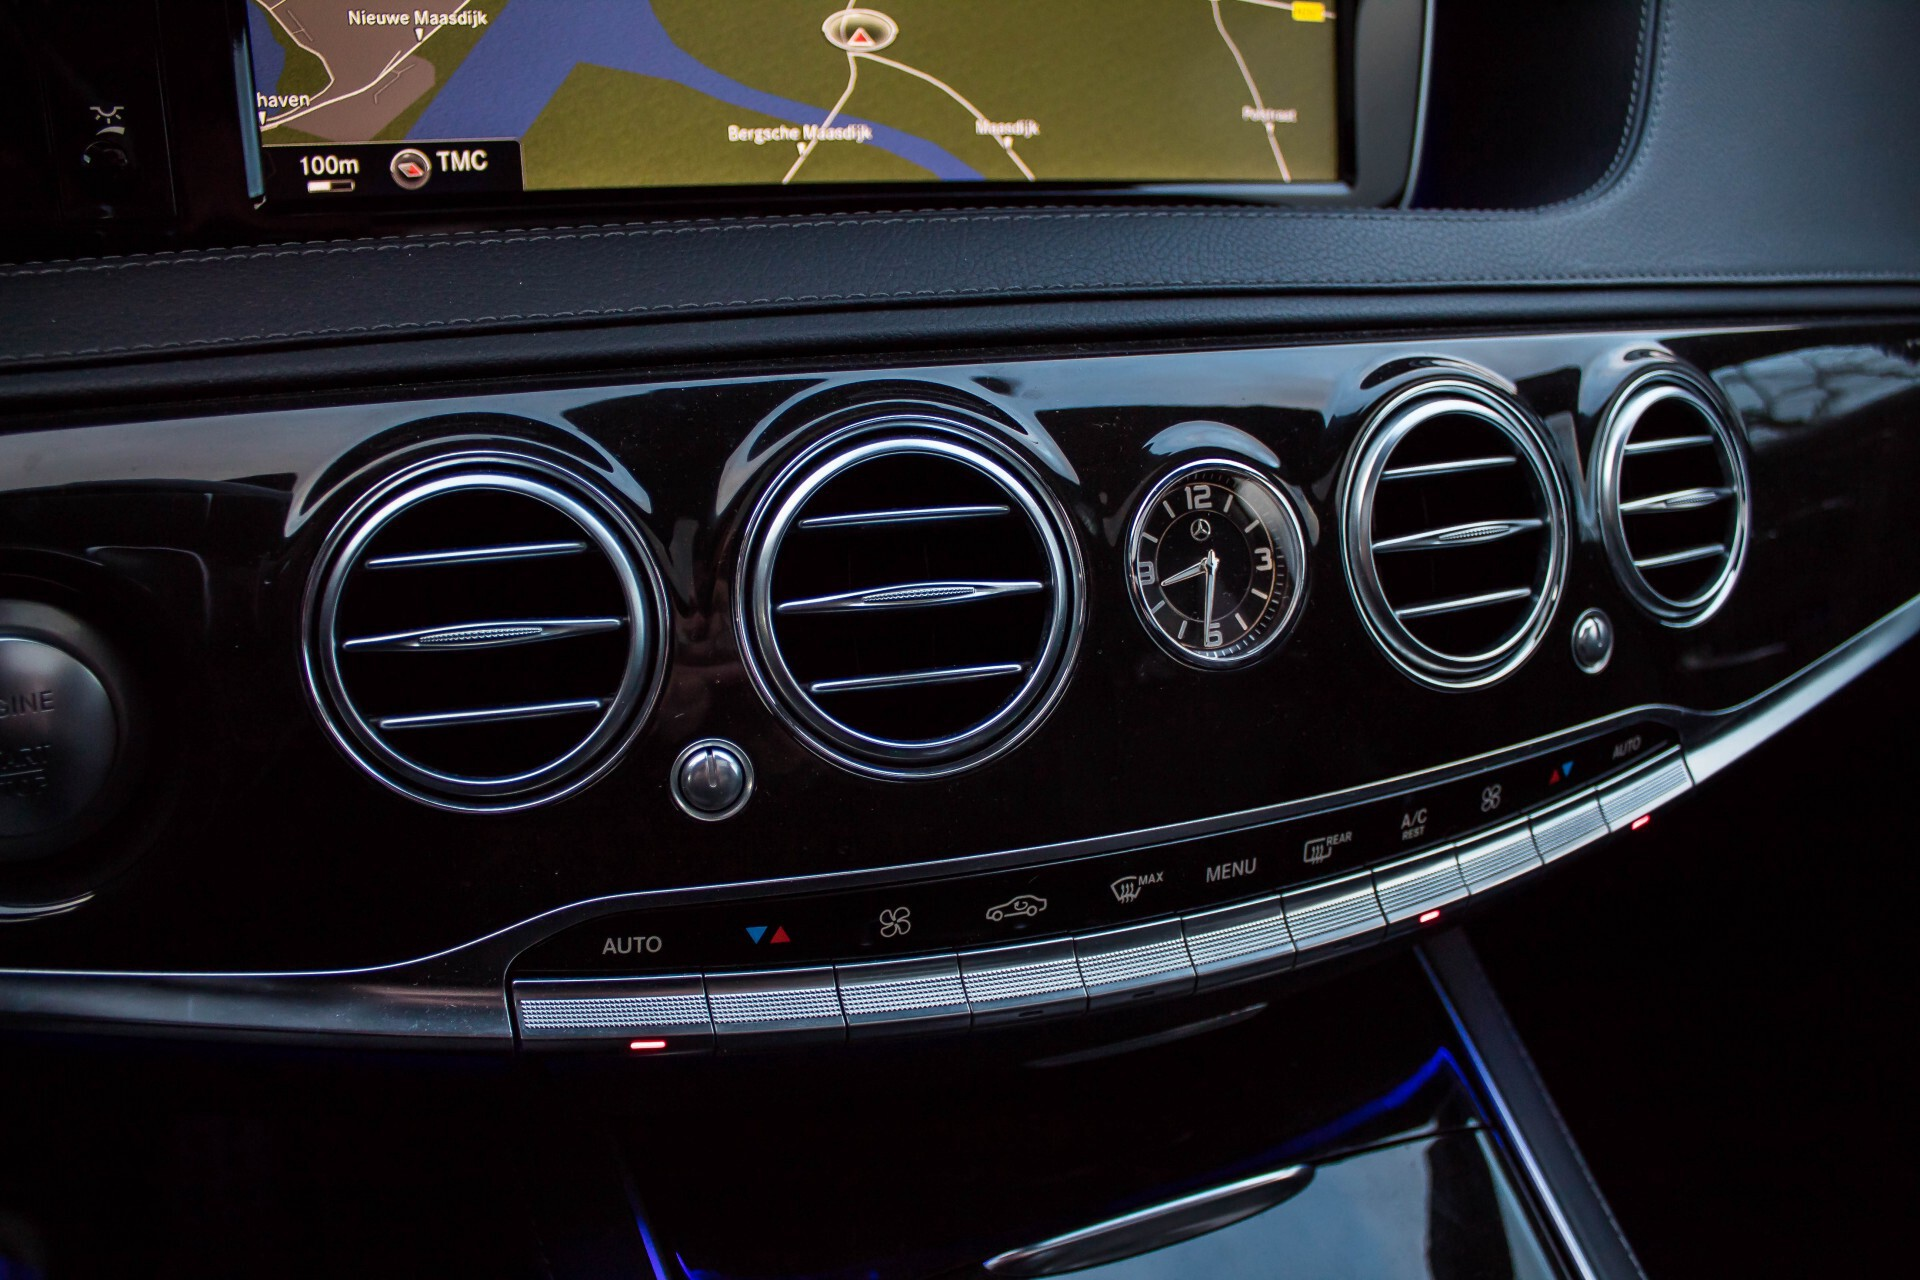 Mercedes-Benz S-Klasse 350 BlueTEC 63 AMG Panorama/Distronic/Keyless/Massage/Burmester Aut7 Foto 12